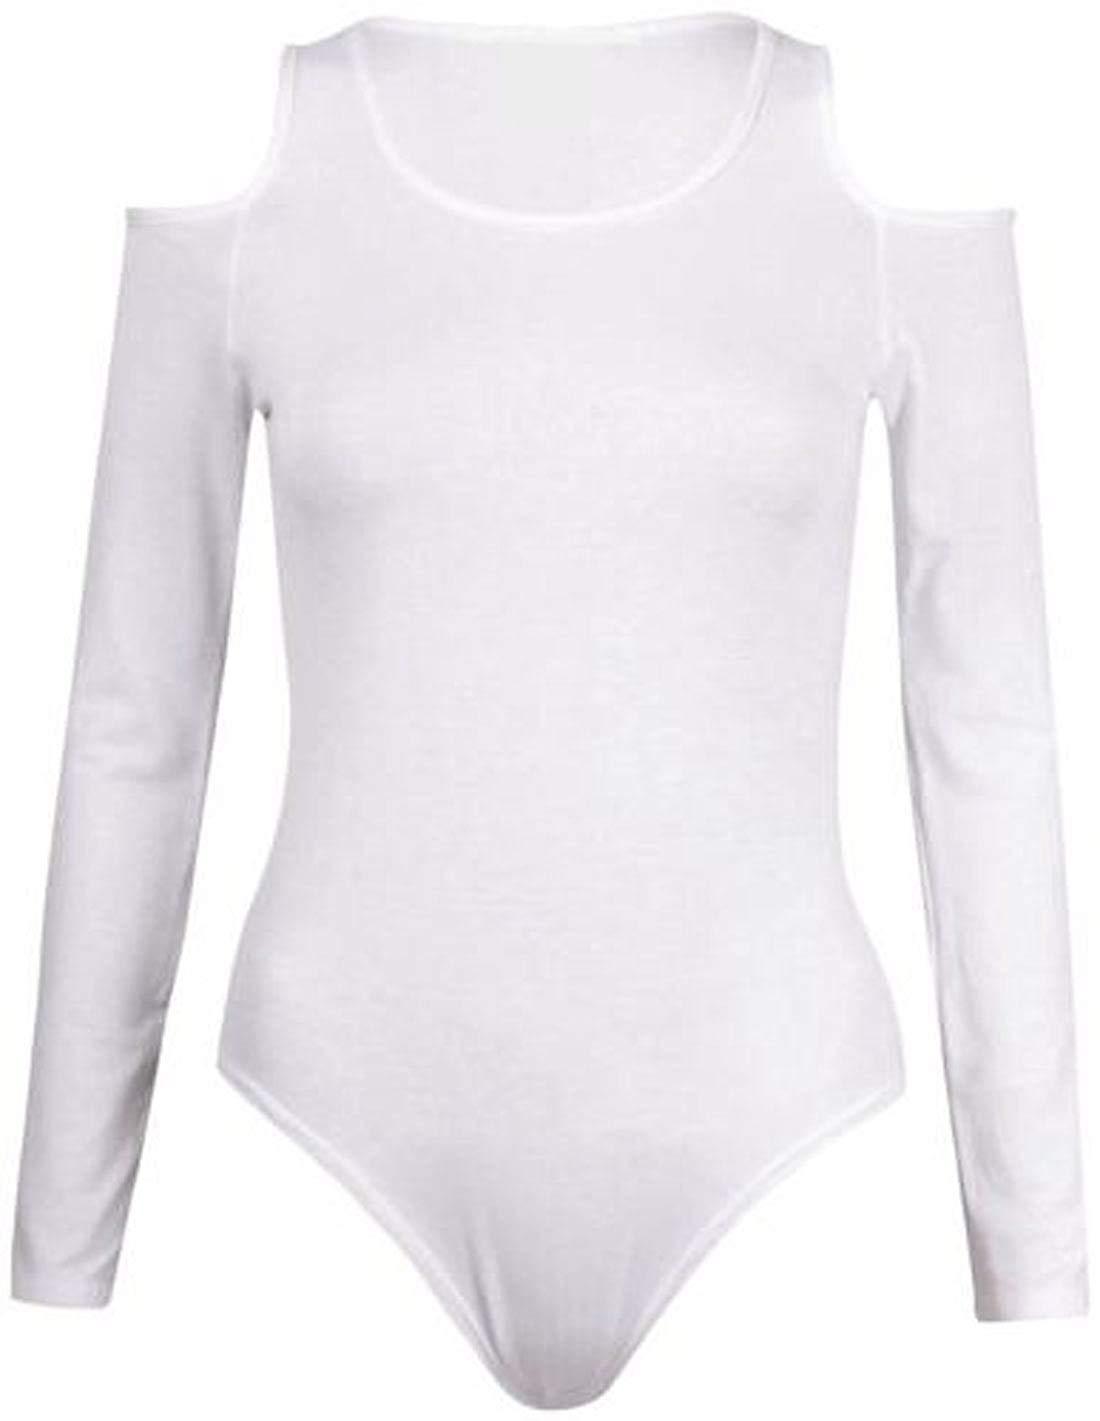 0f9d0a9e7da8 Get Quotations · REAL LIFE FASHION LTD Ladies Style Cold Shoulder Bodysuit  Womens Long Sleeve Cut Out Leotard Body